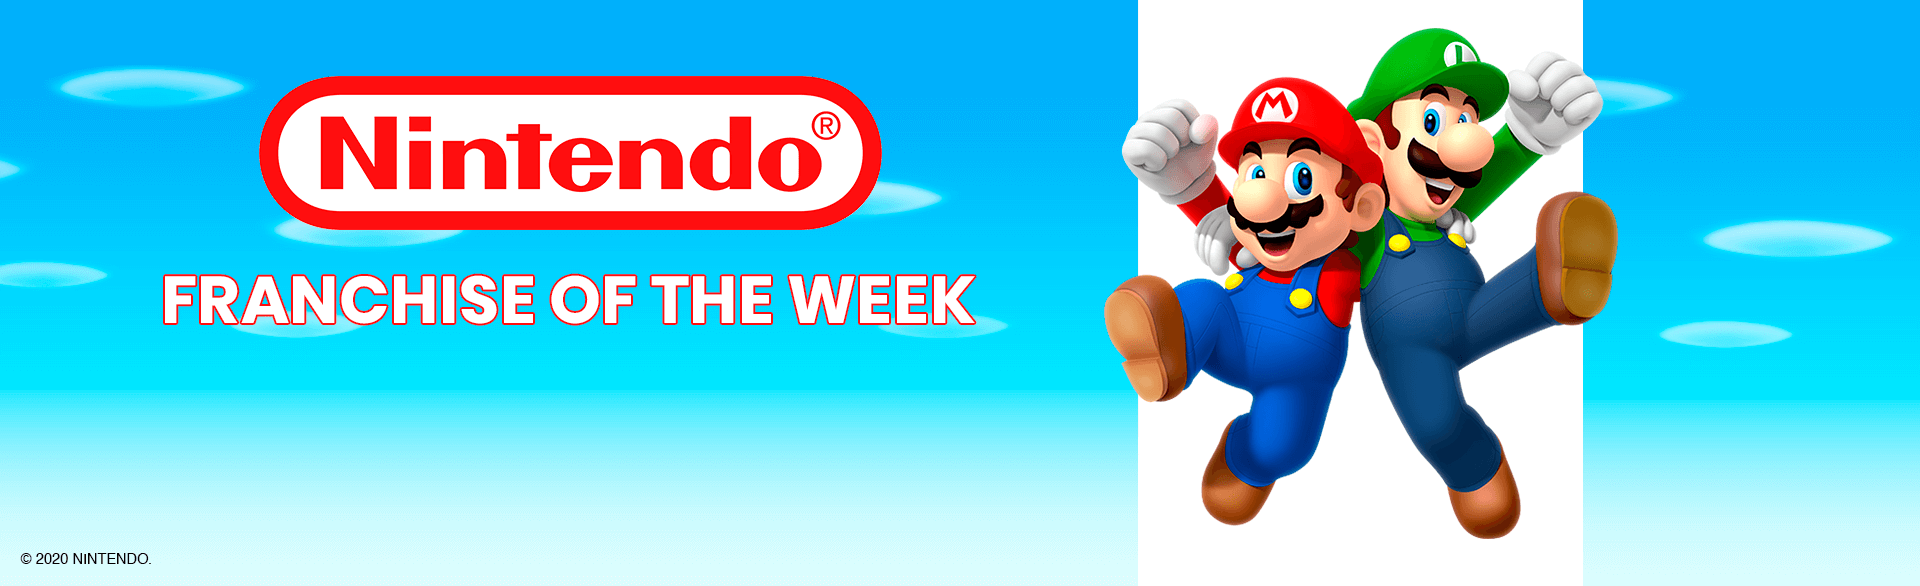 Nintendo Offers